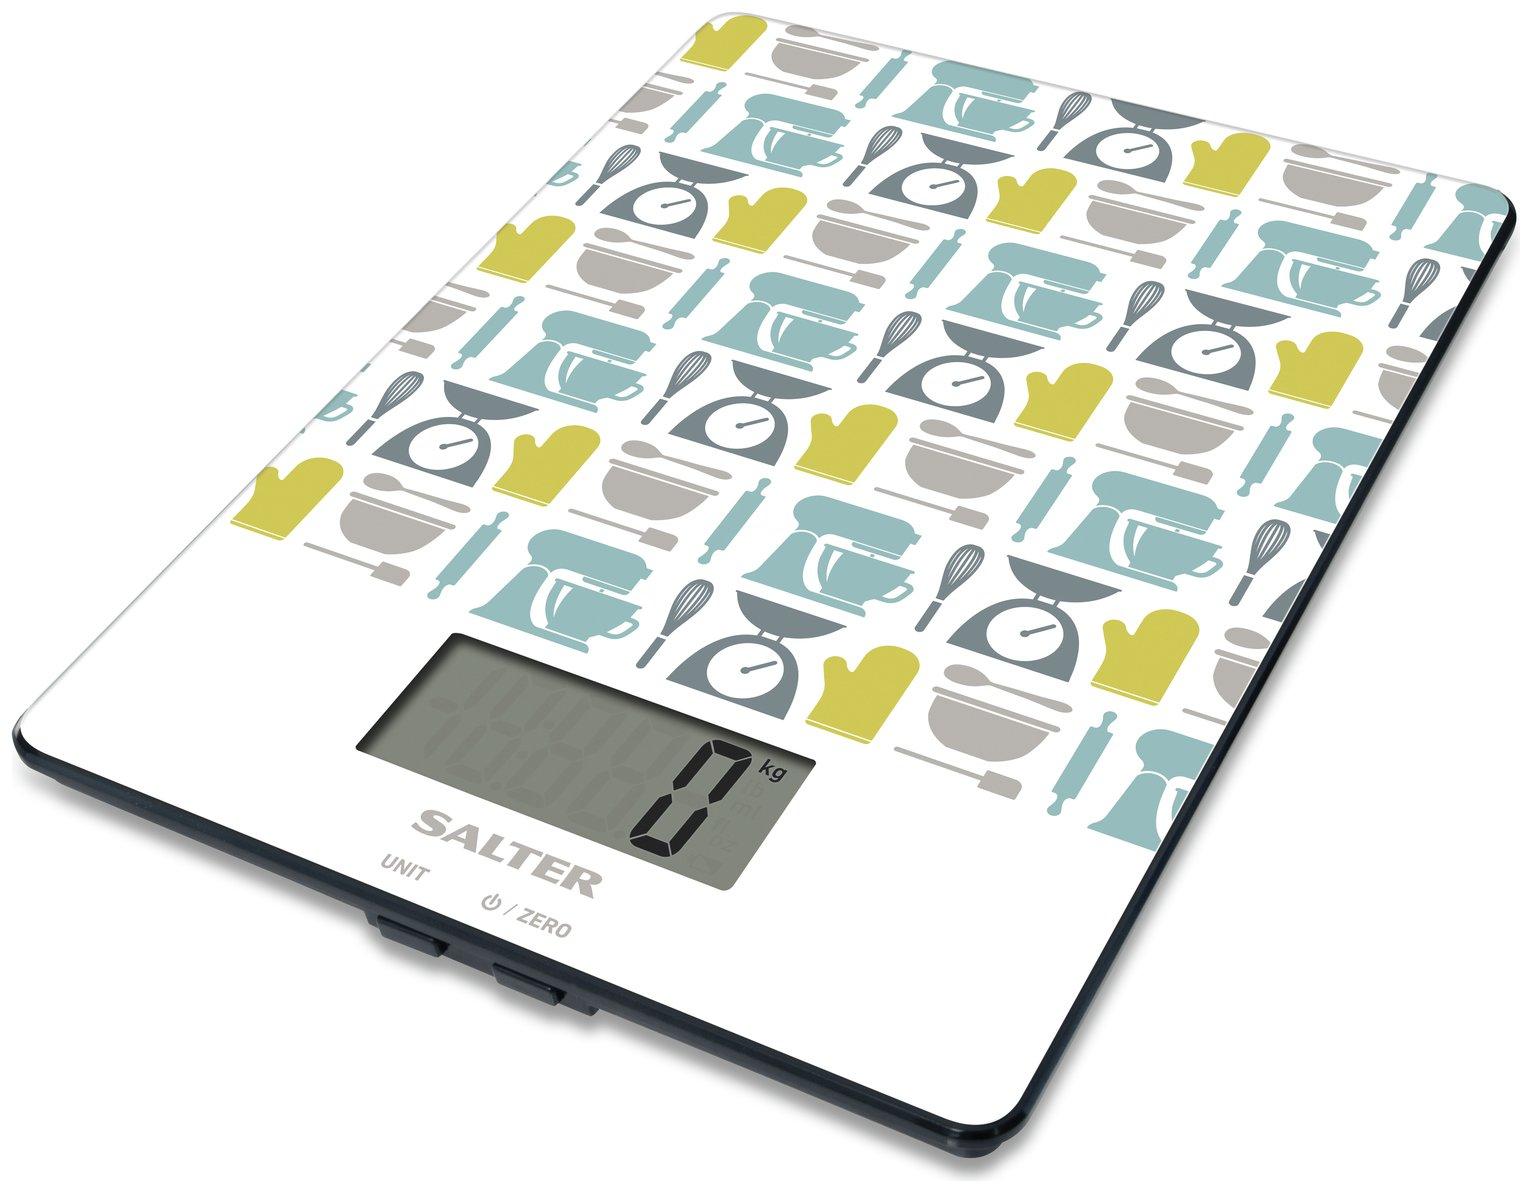 Salter Gadget Digital Kitchen Scale Reviews